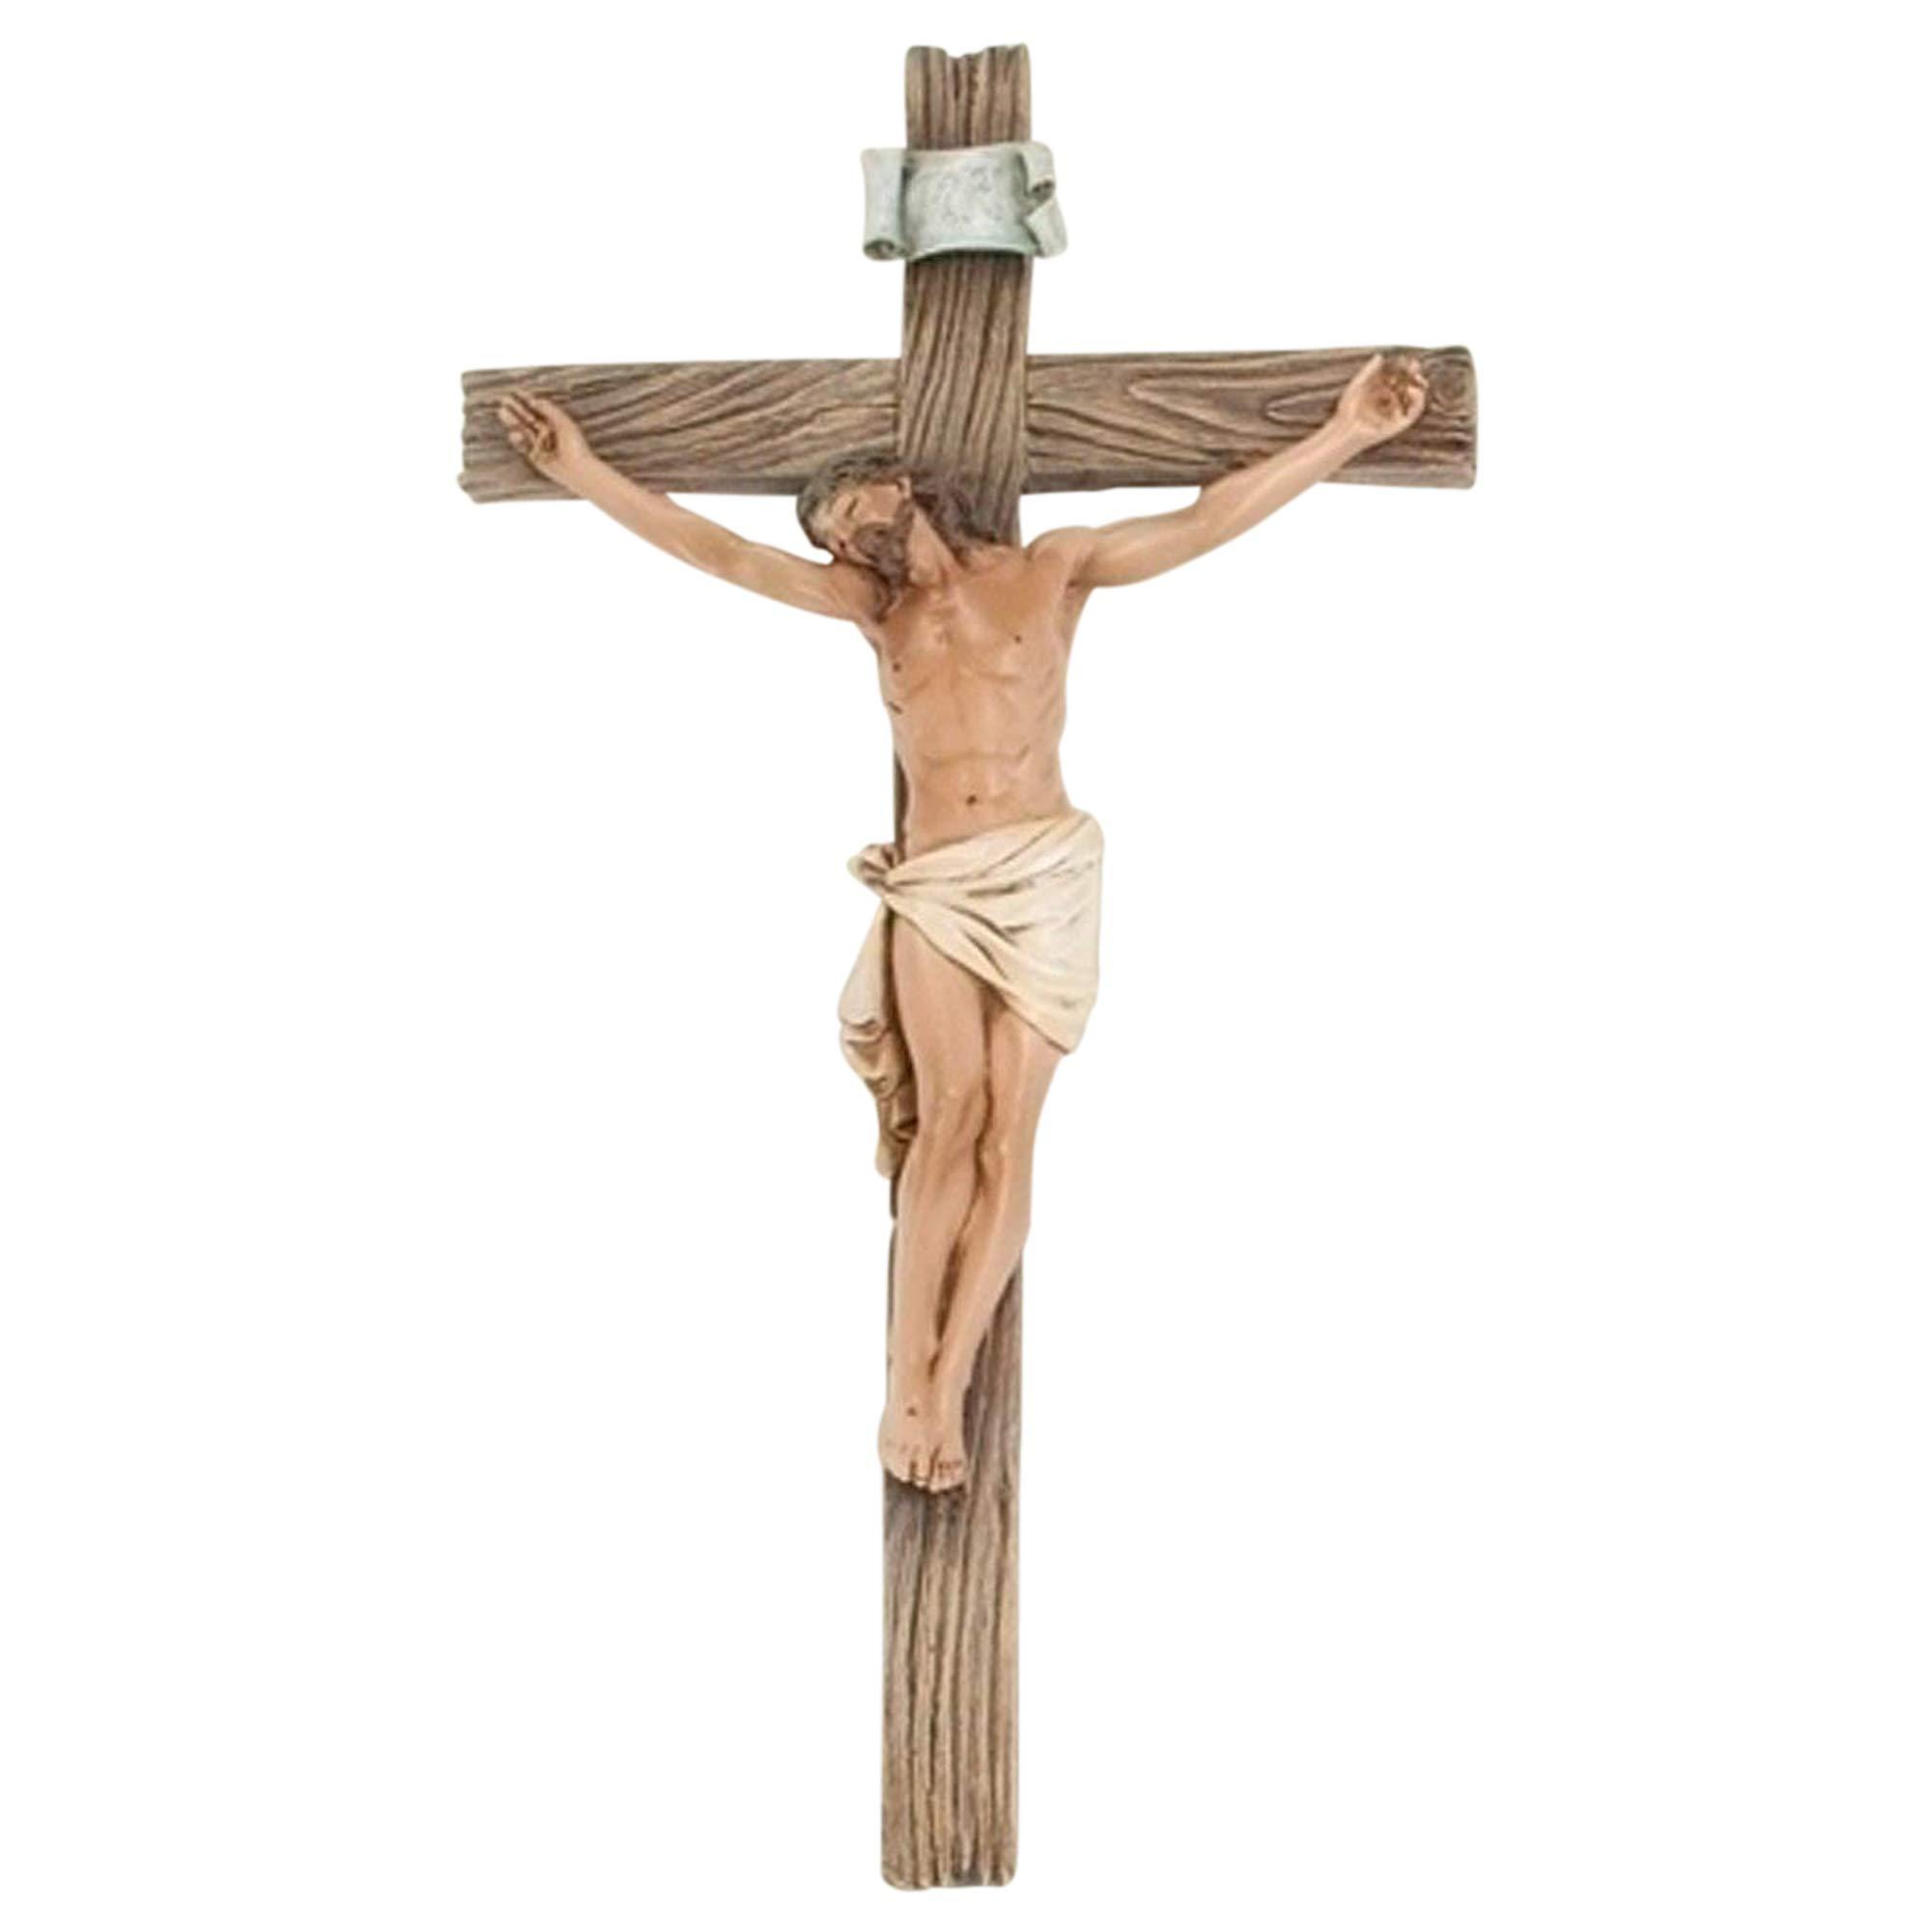 Roman Traditional Figure Textured Wood Look 4.25 x 8 Resin Stone Wall Crucifix